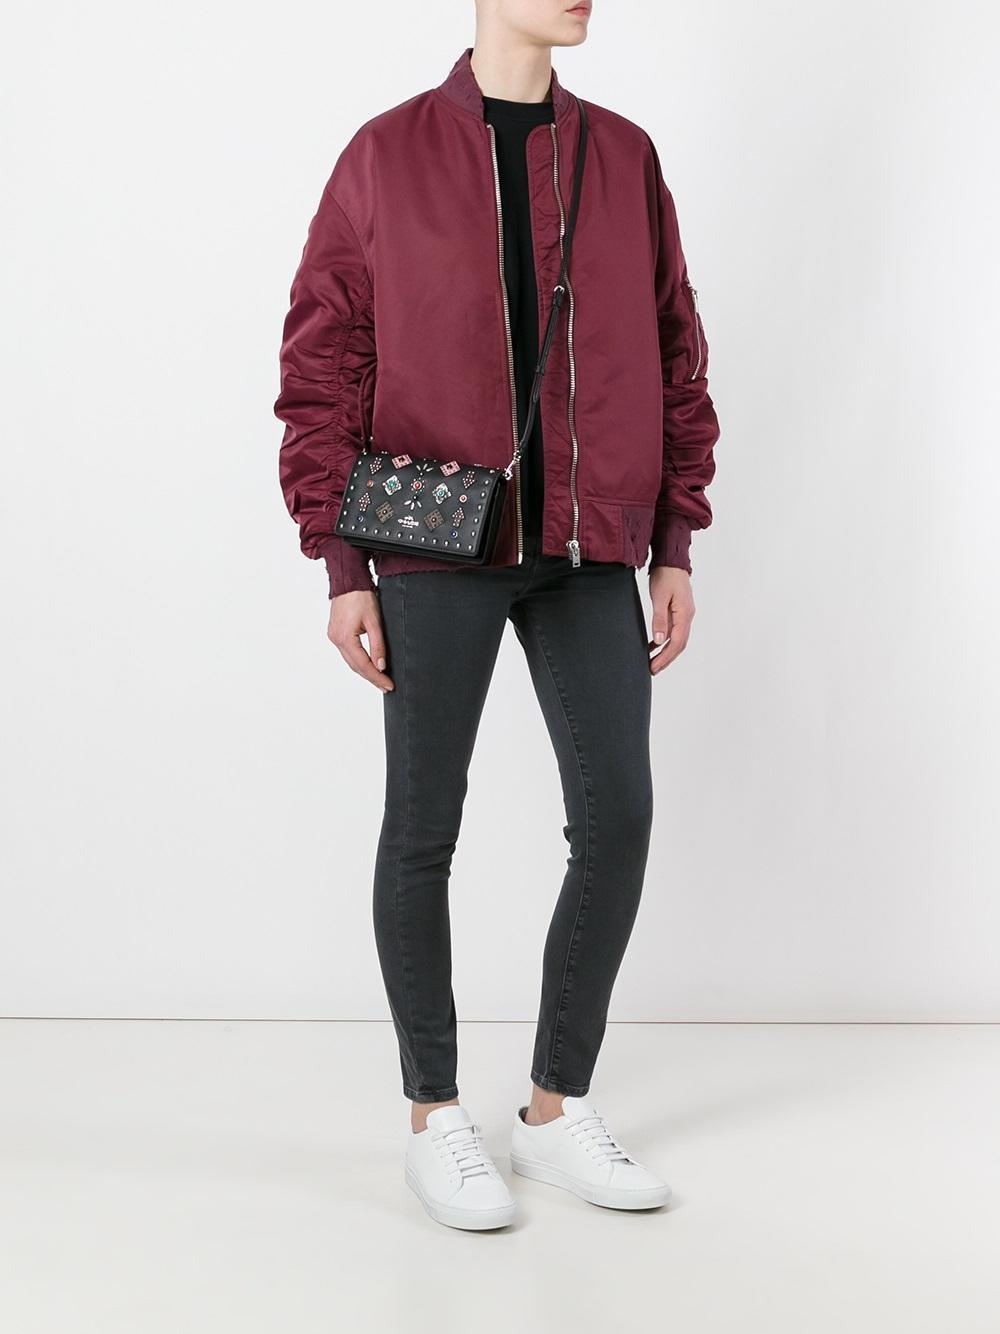 COACH Leather Western Rivet Crossbody Bag in Black